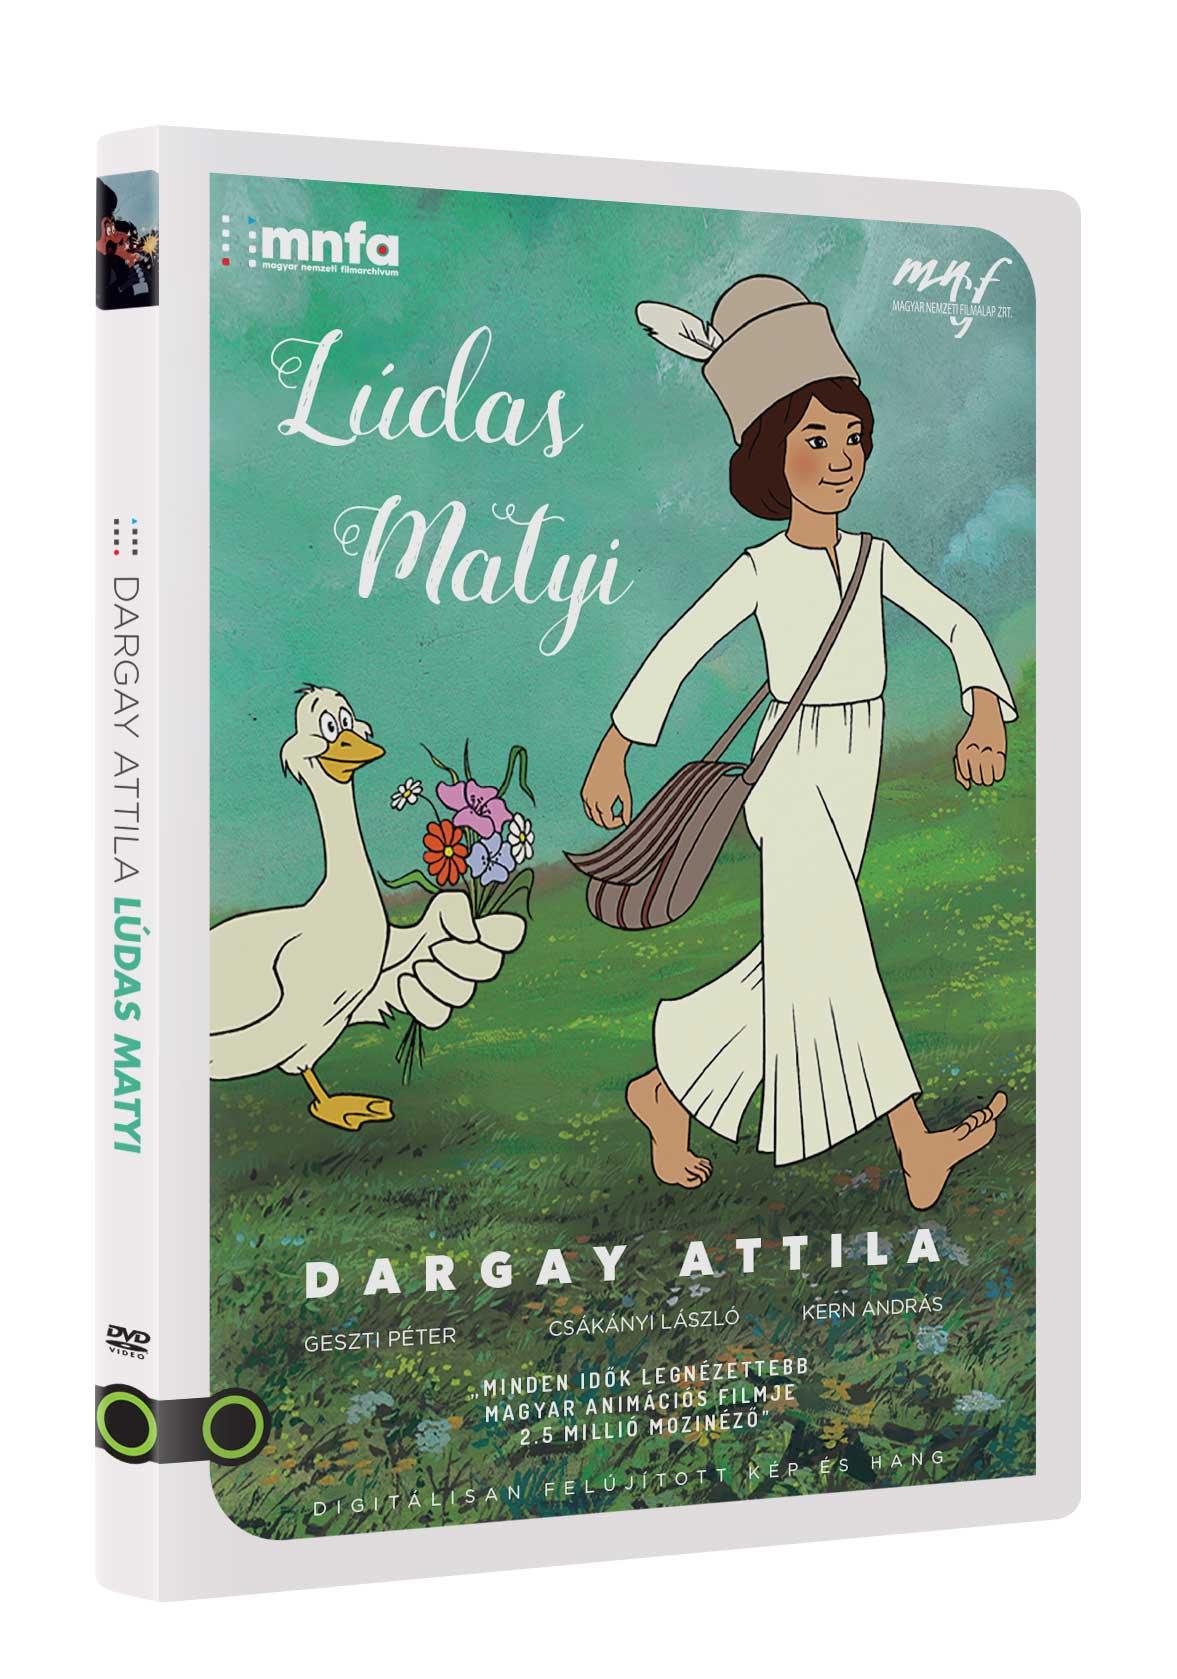 Lúdas Matyi (MNFA kiadás) - DVD